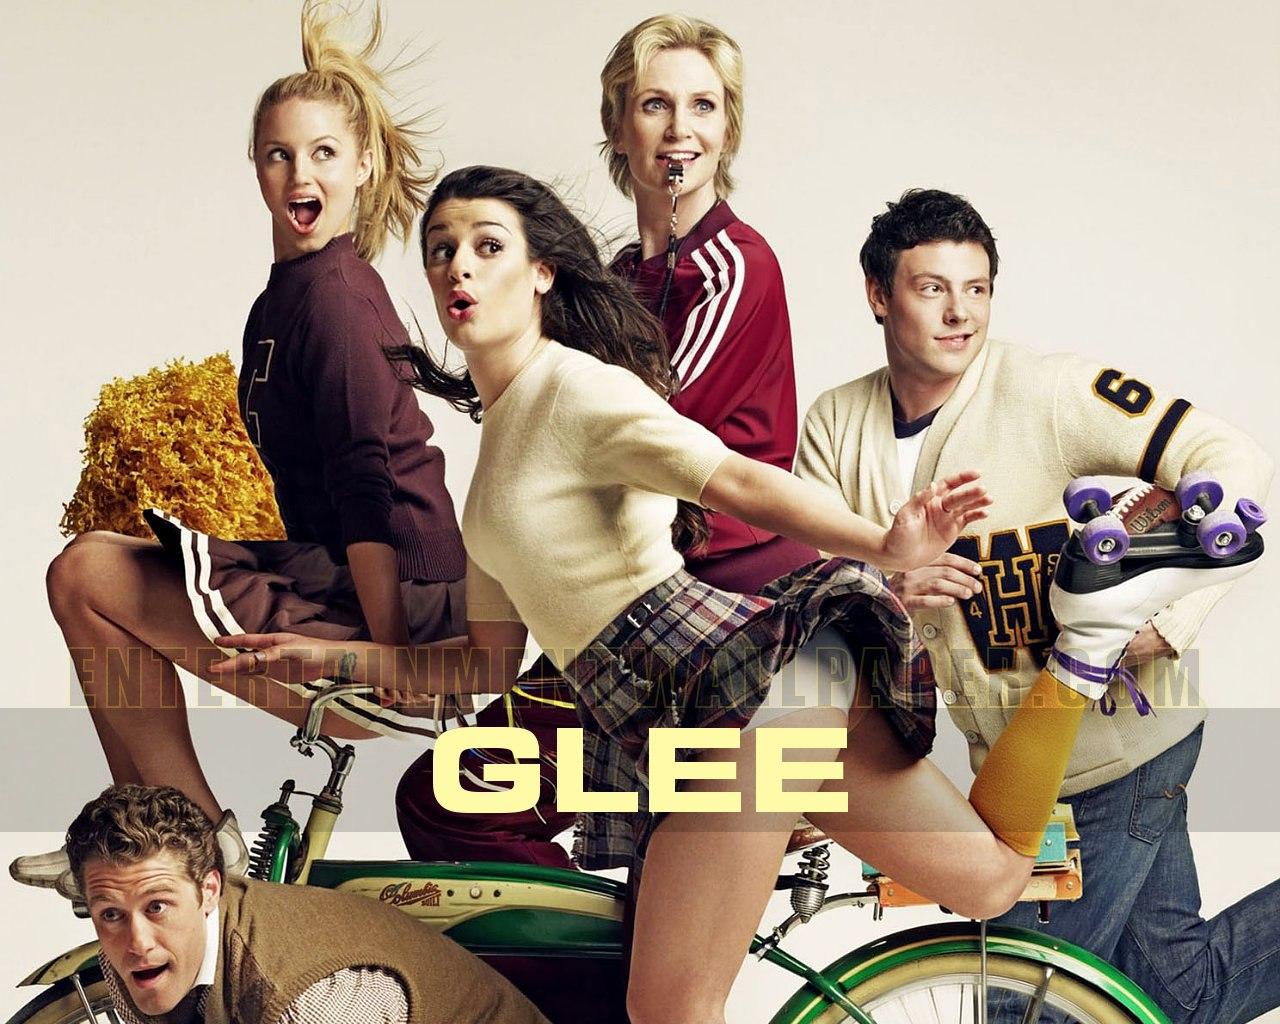 Glee.S05E08 (wgrane napisy PL) .rmvb